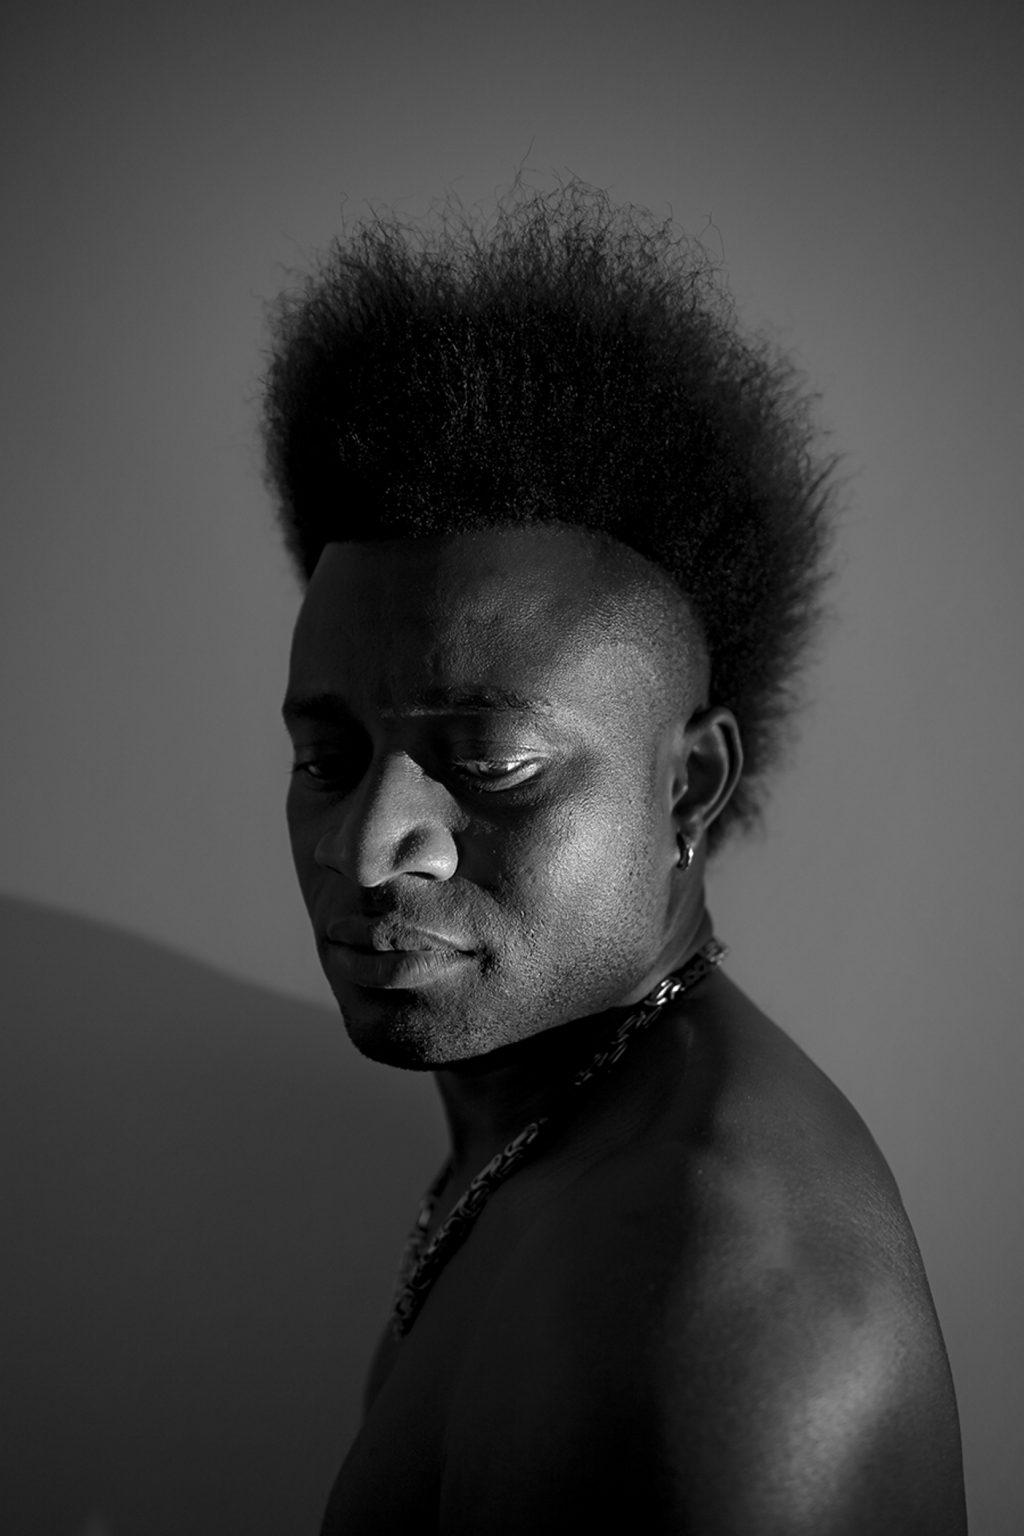 Portrait of an asylum seeker born in 1995 in Guinea Bissau. Reggio Emilia, Italy, 2019